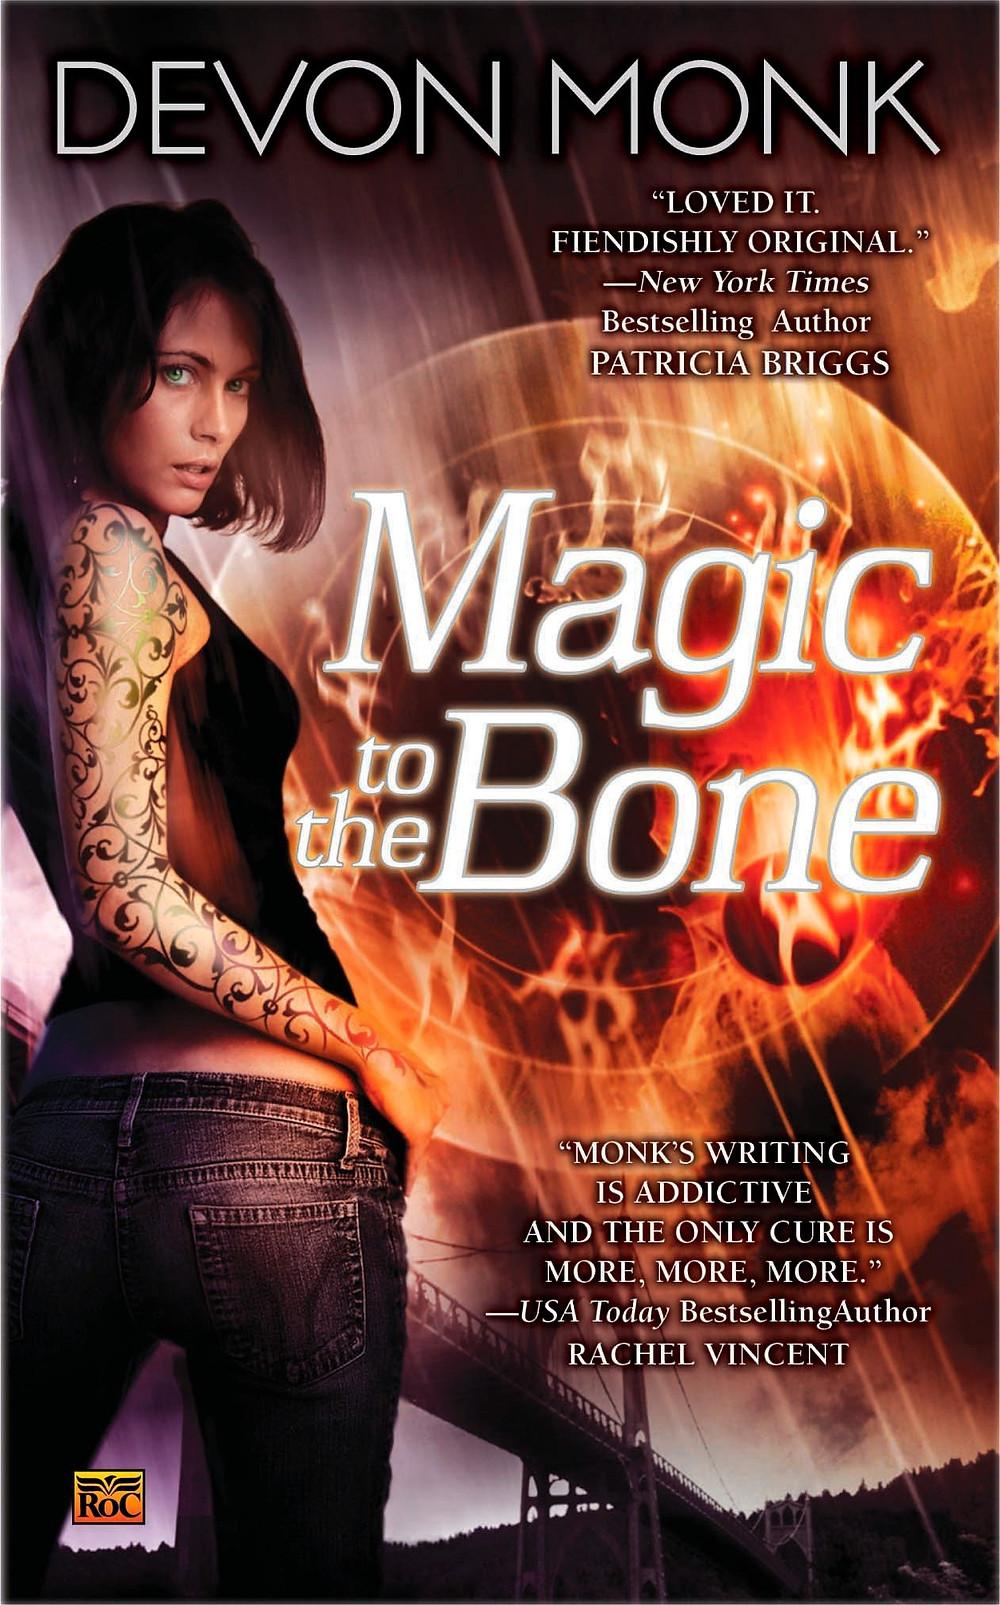 Magic to the Bone by Devon Monk | Book Review